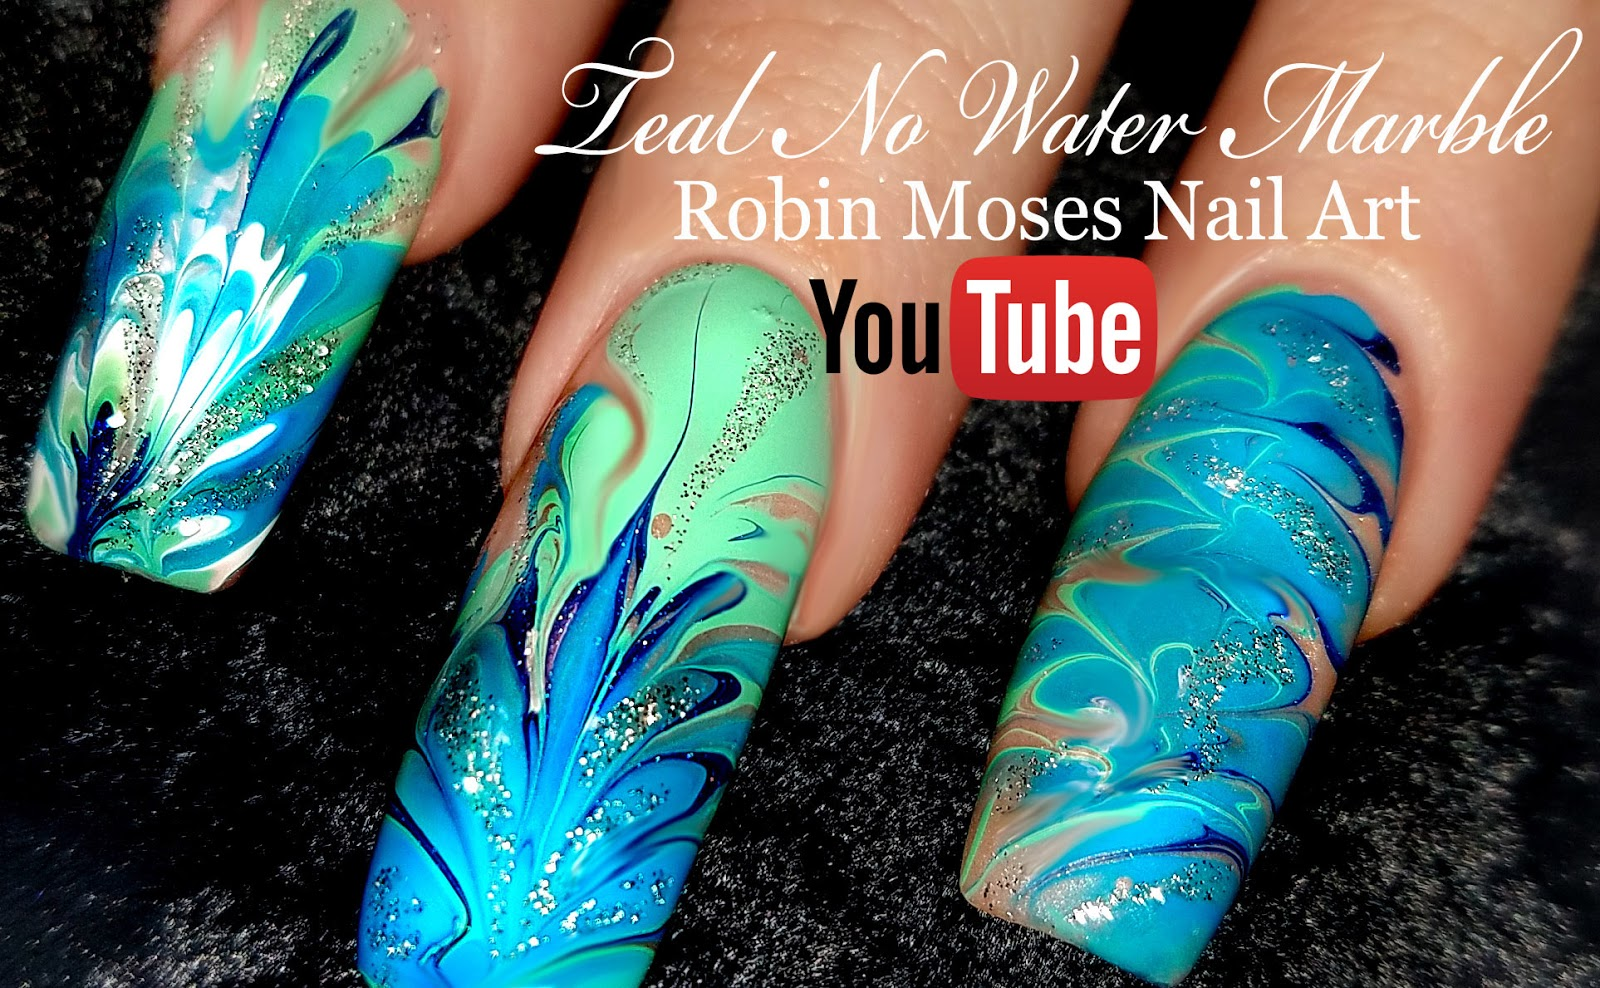 Robin moses nail art no water needed mint mani diva diy drag no water needed mint mani diva diy drag marble nail art tutorial prinsesfo Gallery